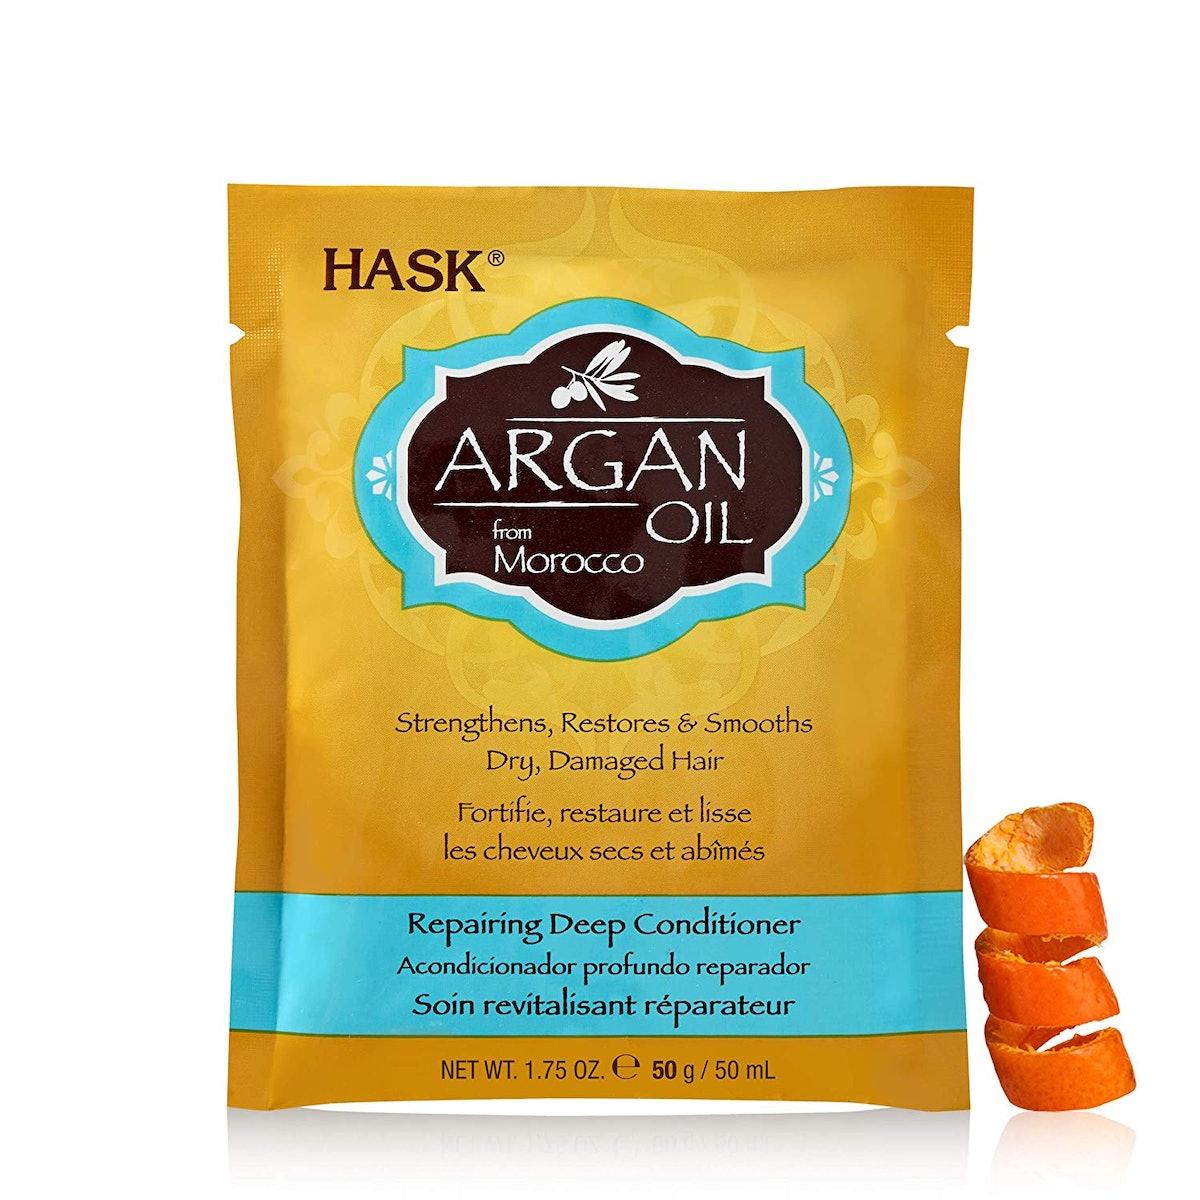 HASK Argan Oil Repairing Deep Conditioner, 12 Count